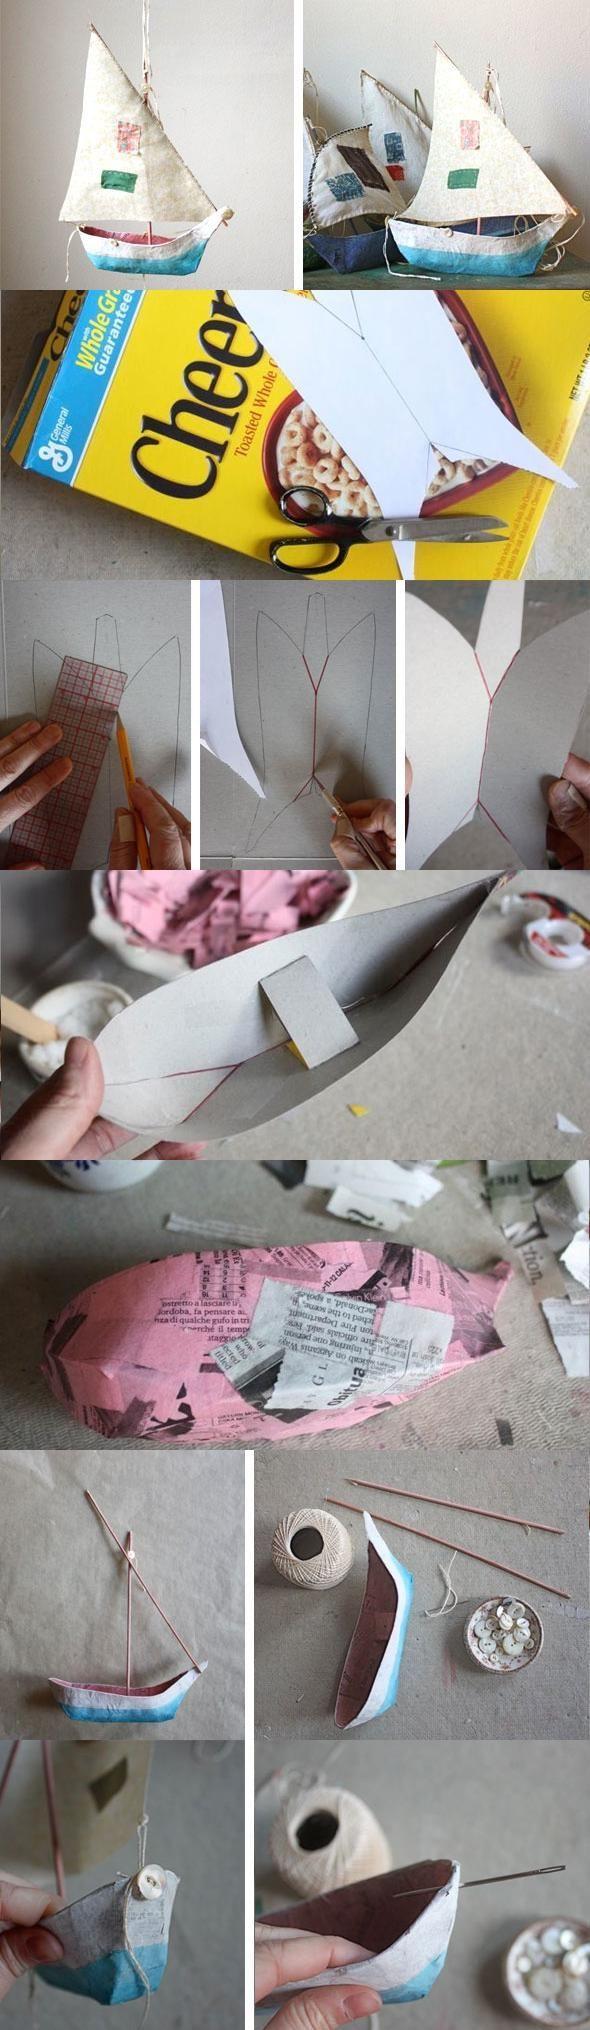 s-media-cache-ak0.pinimg.com 736x b6 bd 8f b6bd8fad9d6559b04322ea9afb6e9cb8.jpg